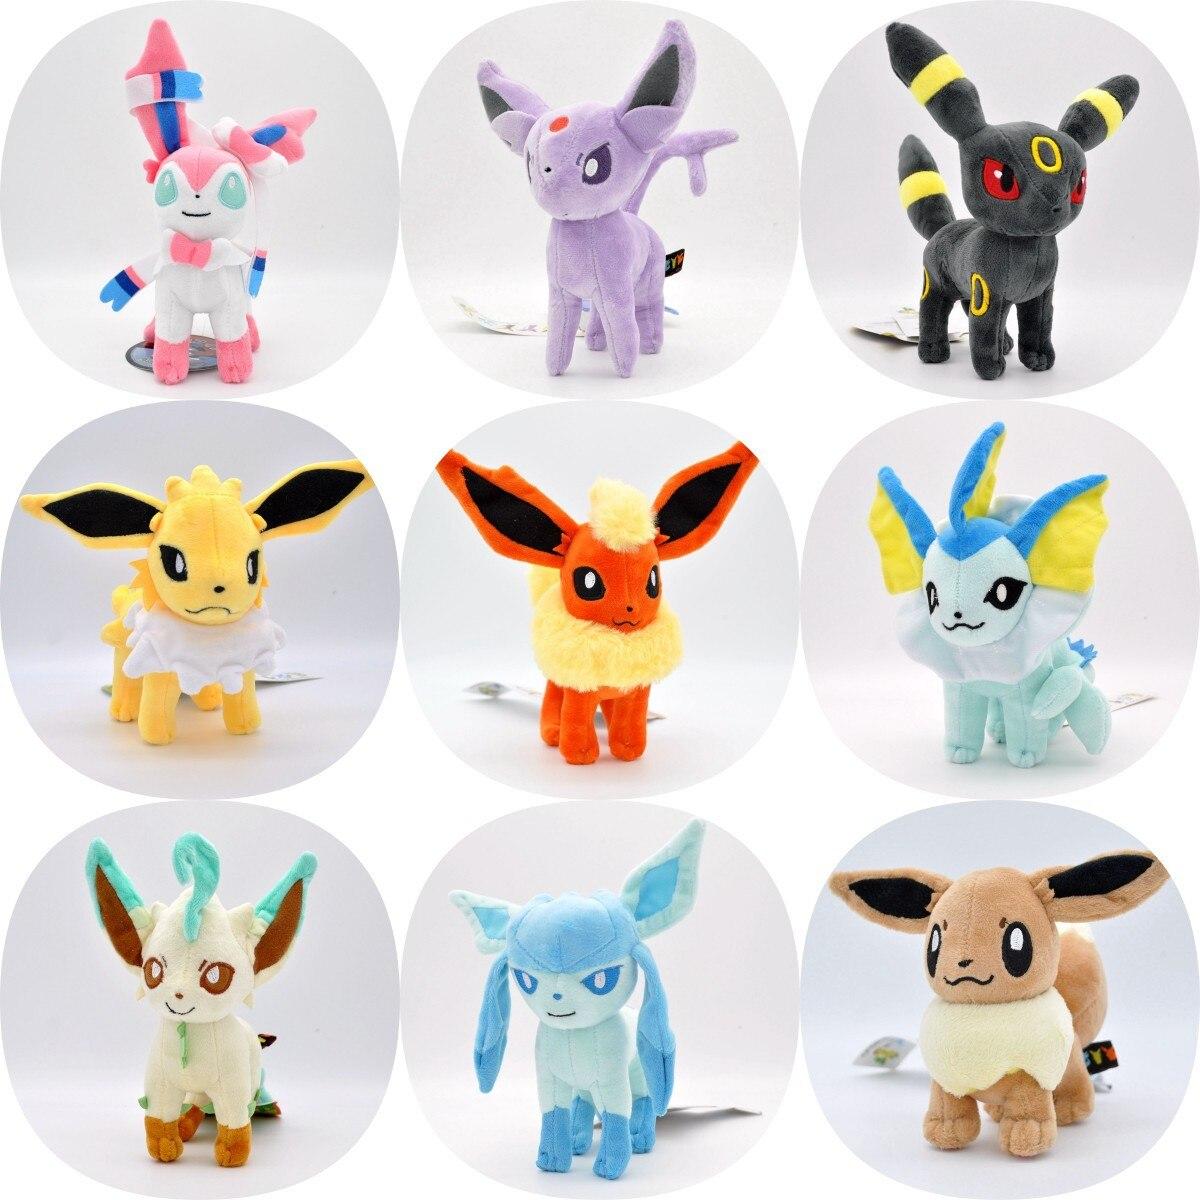 9 Styles TAKARA TOMY Pokemon  Pikachu Squirtle Stuffed Hobby Anime Plush Doll Toys For Children Christmas Event Gift